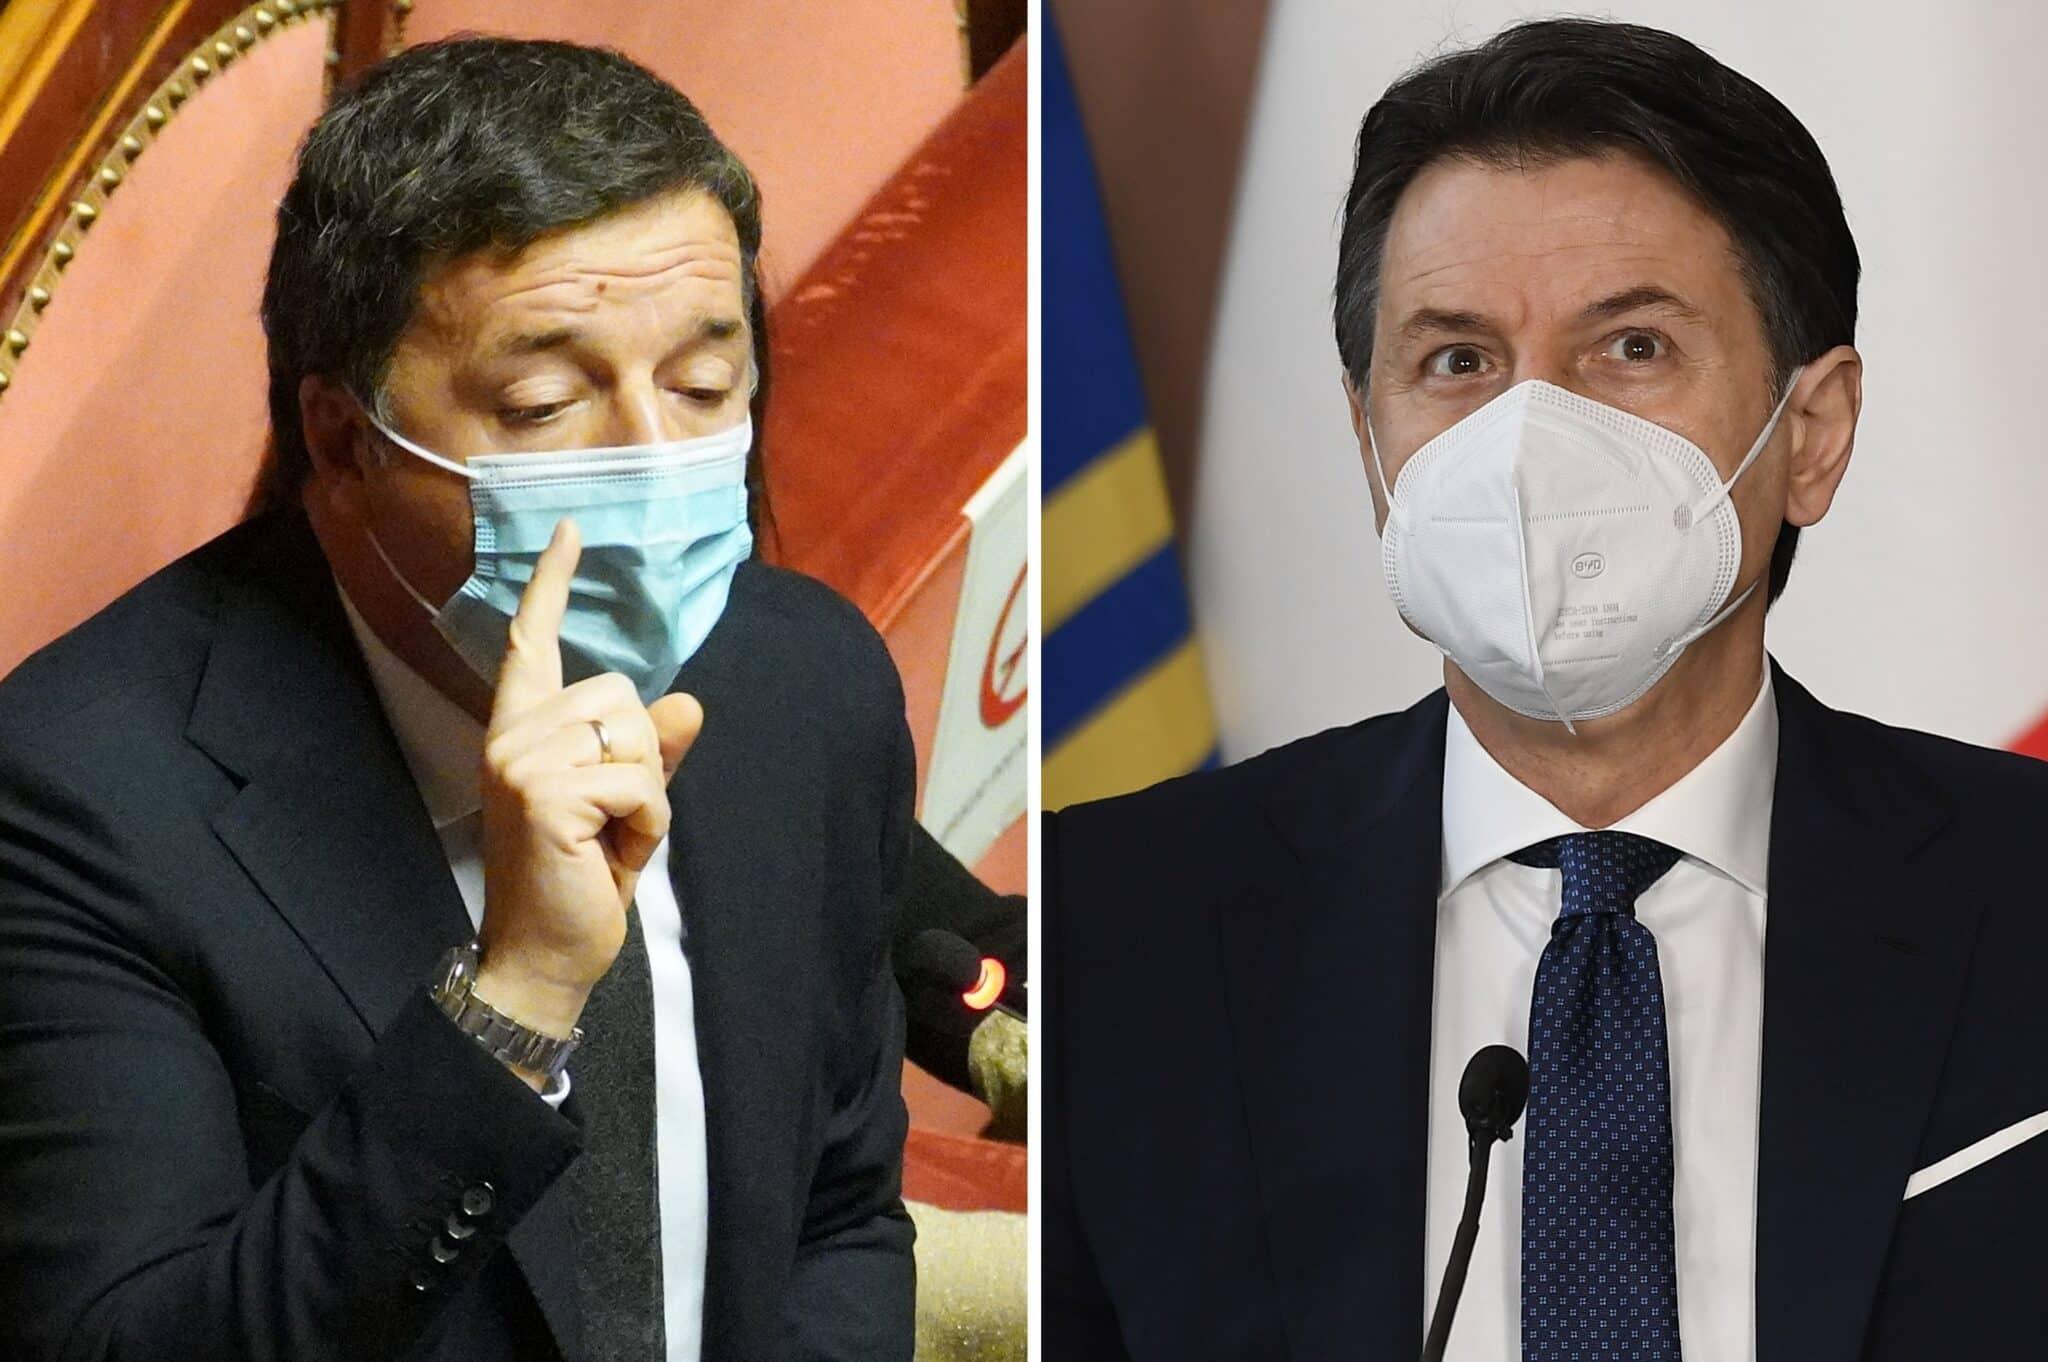 Governo, Renzi